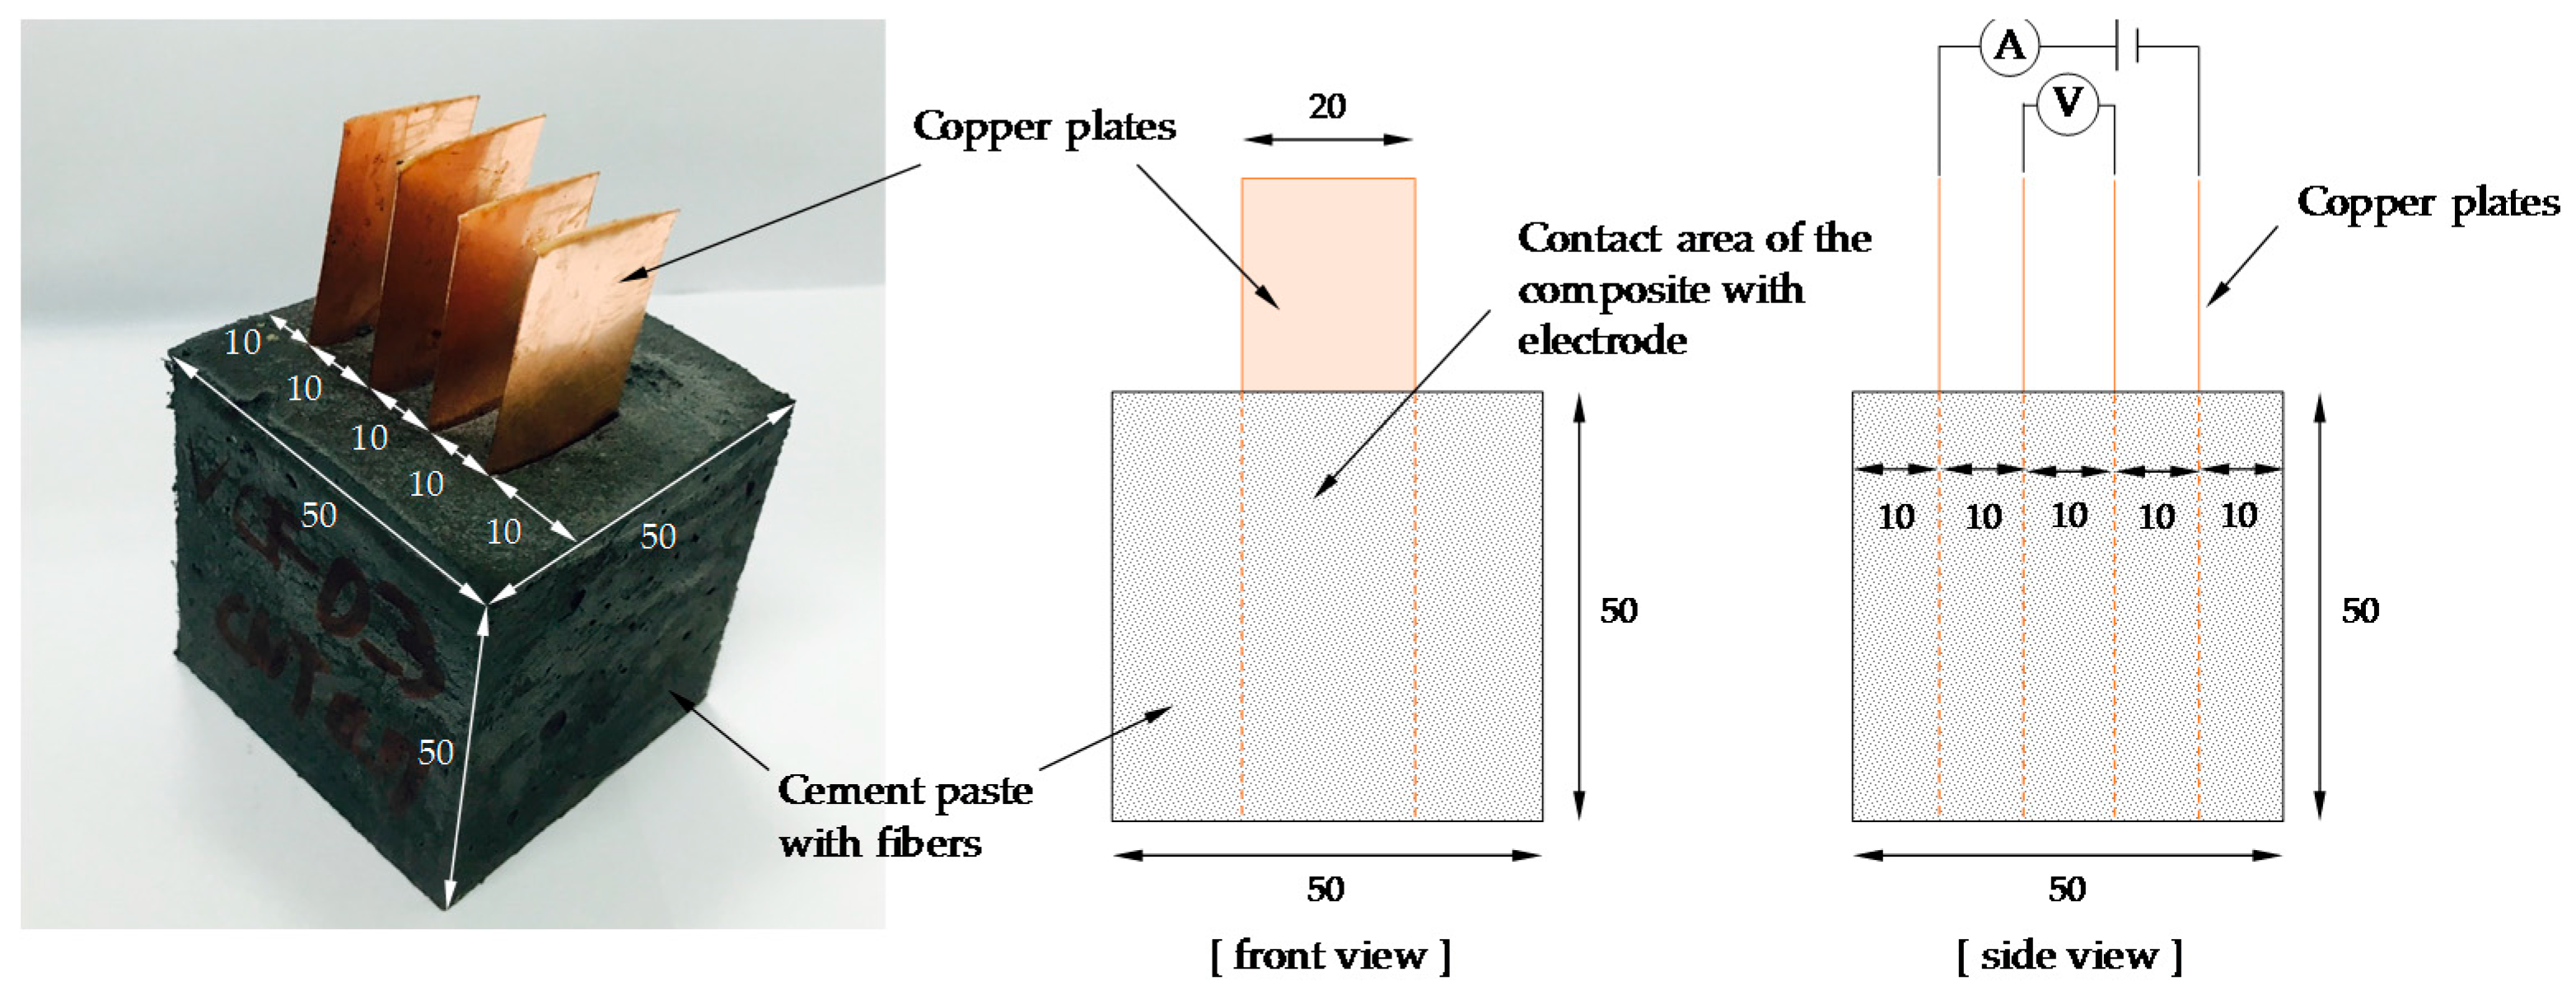 Investigation to measure the resistivity of graphite essay